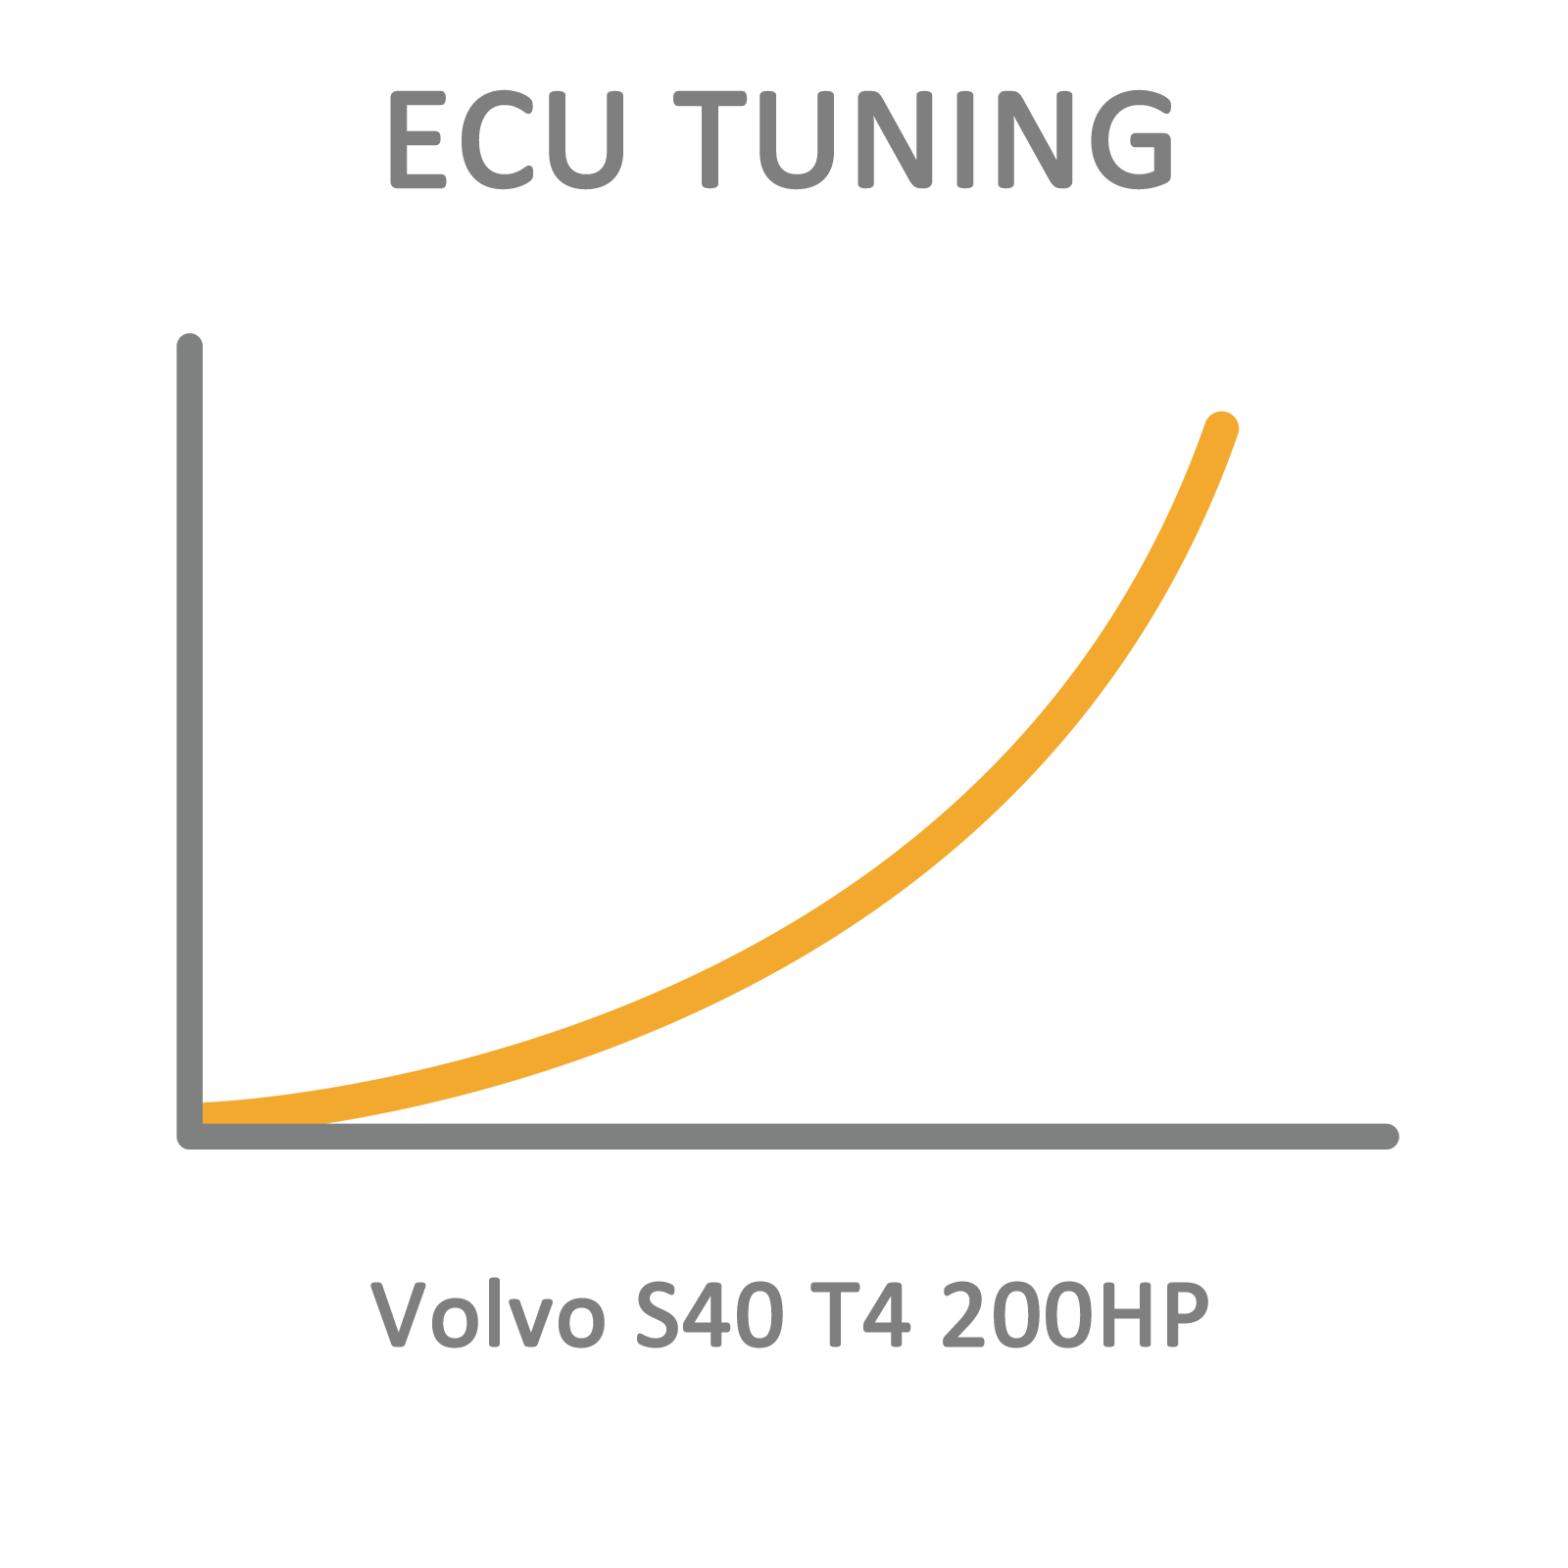 Volvo S40 T4 200HP ECU Tuning Remapping Programming